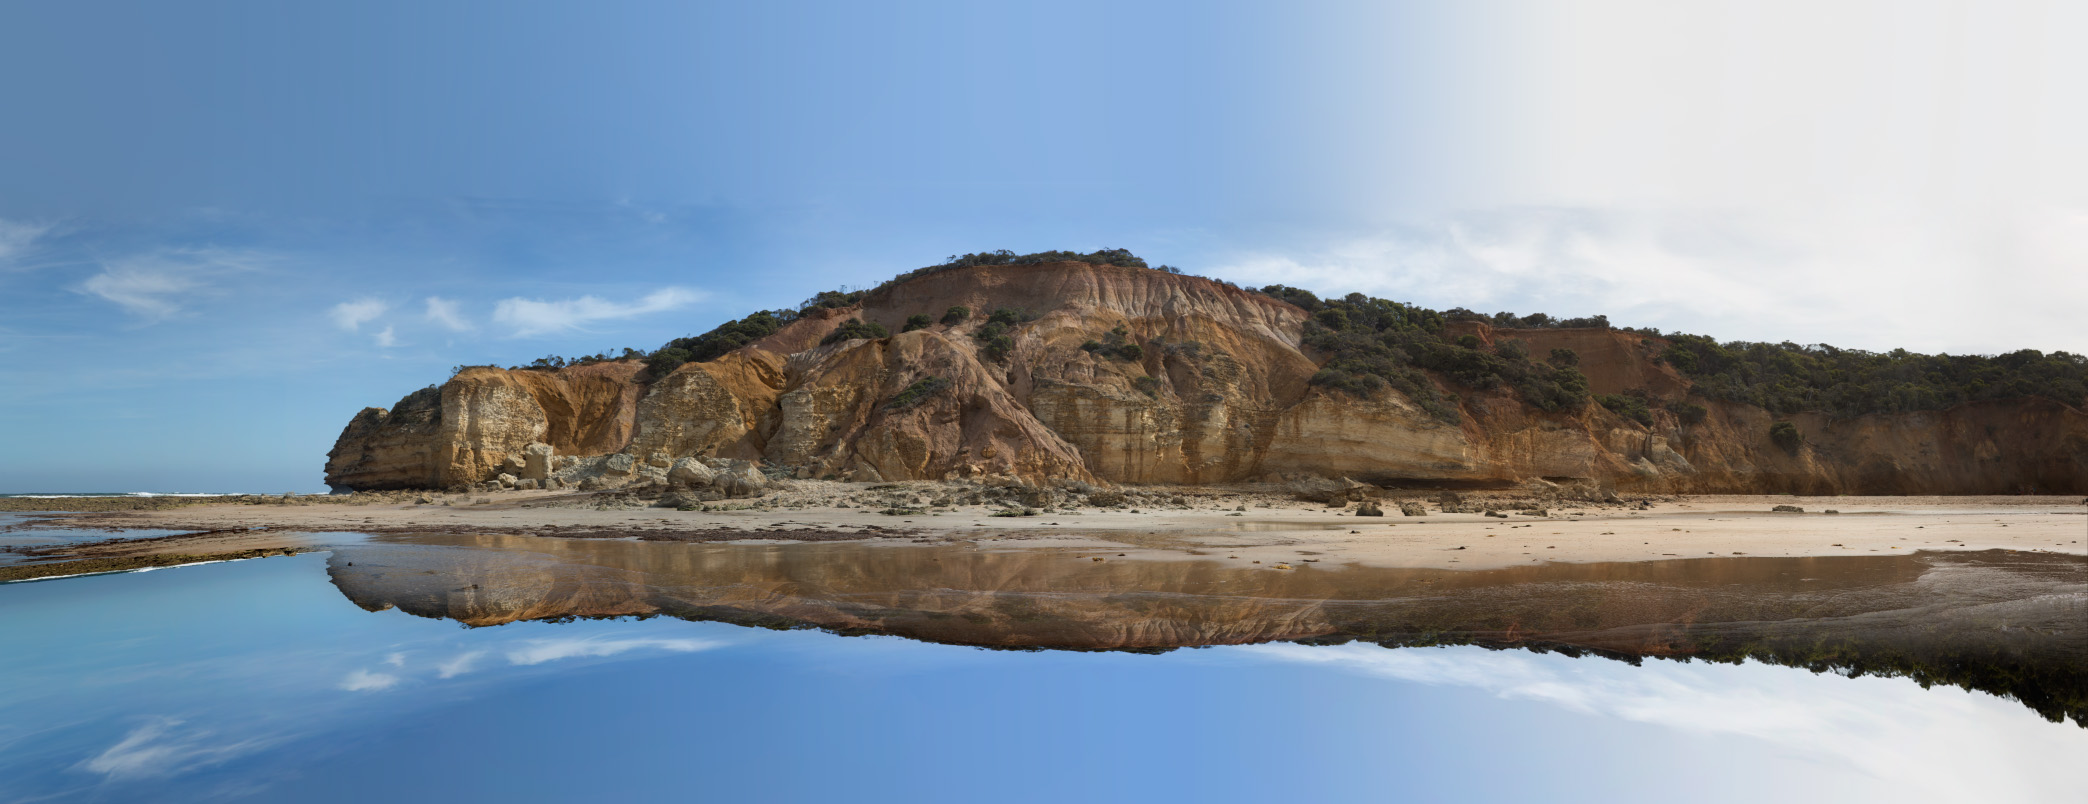 Snake Head point, Point Addis